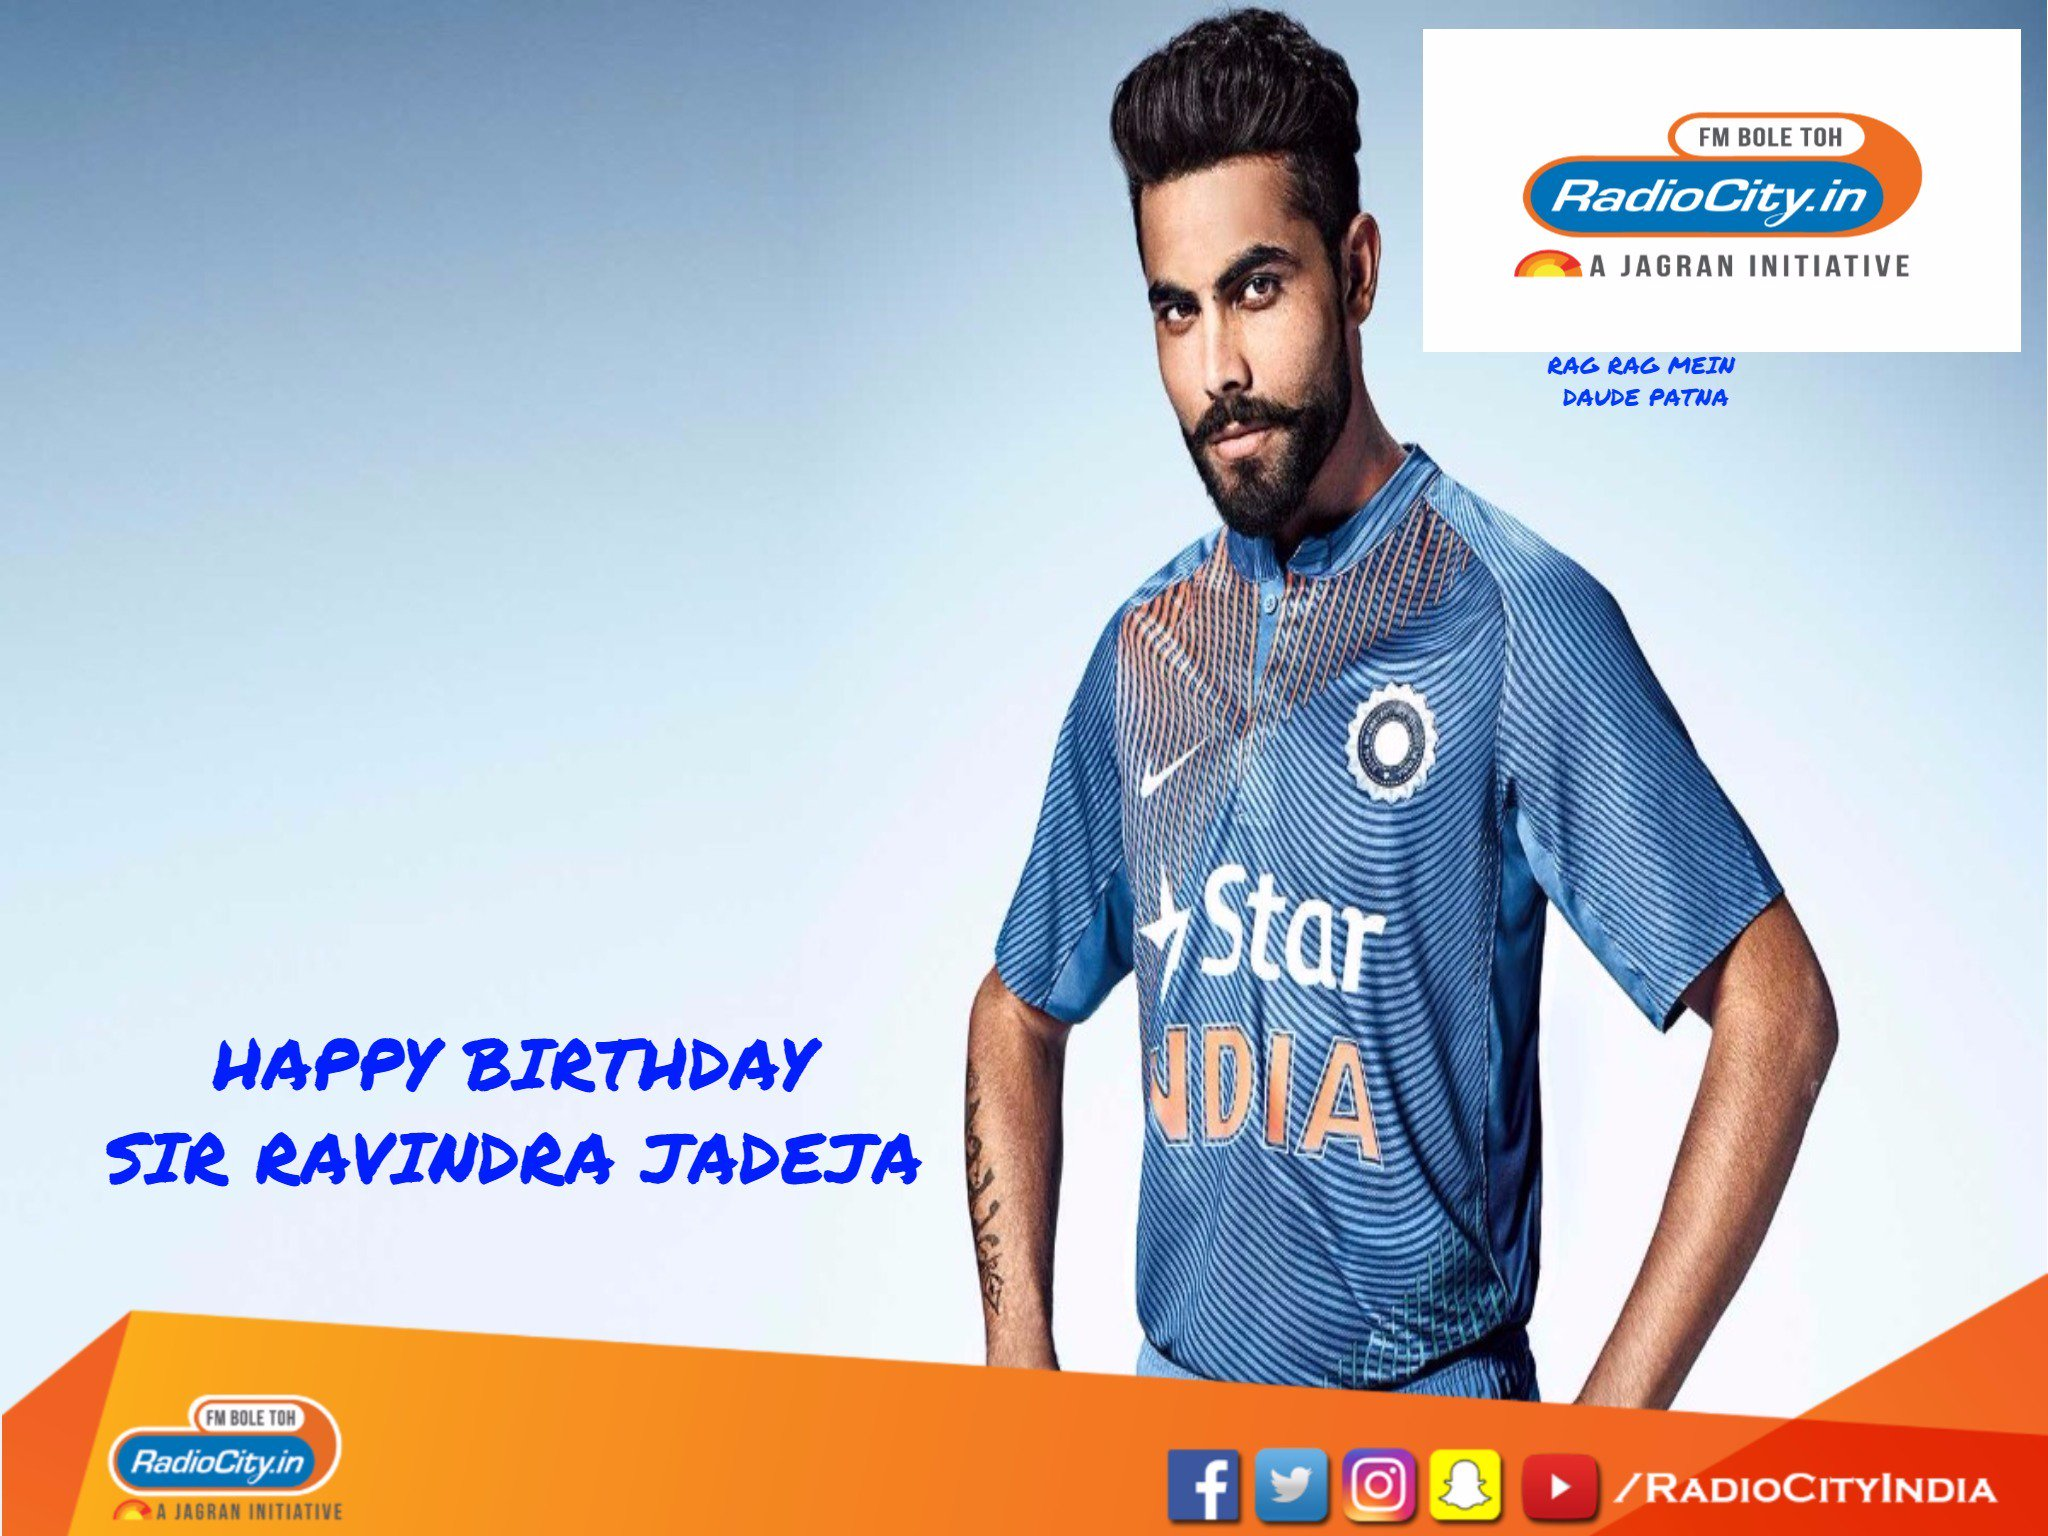 Happy Birthday Ravindra Jadeja